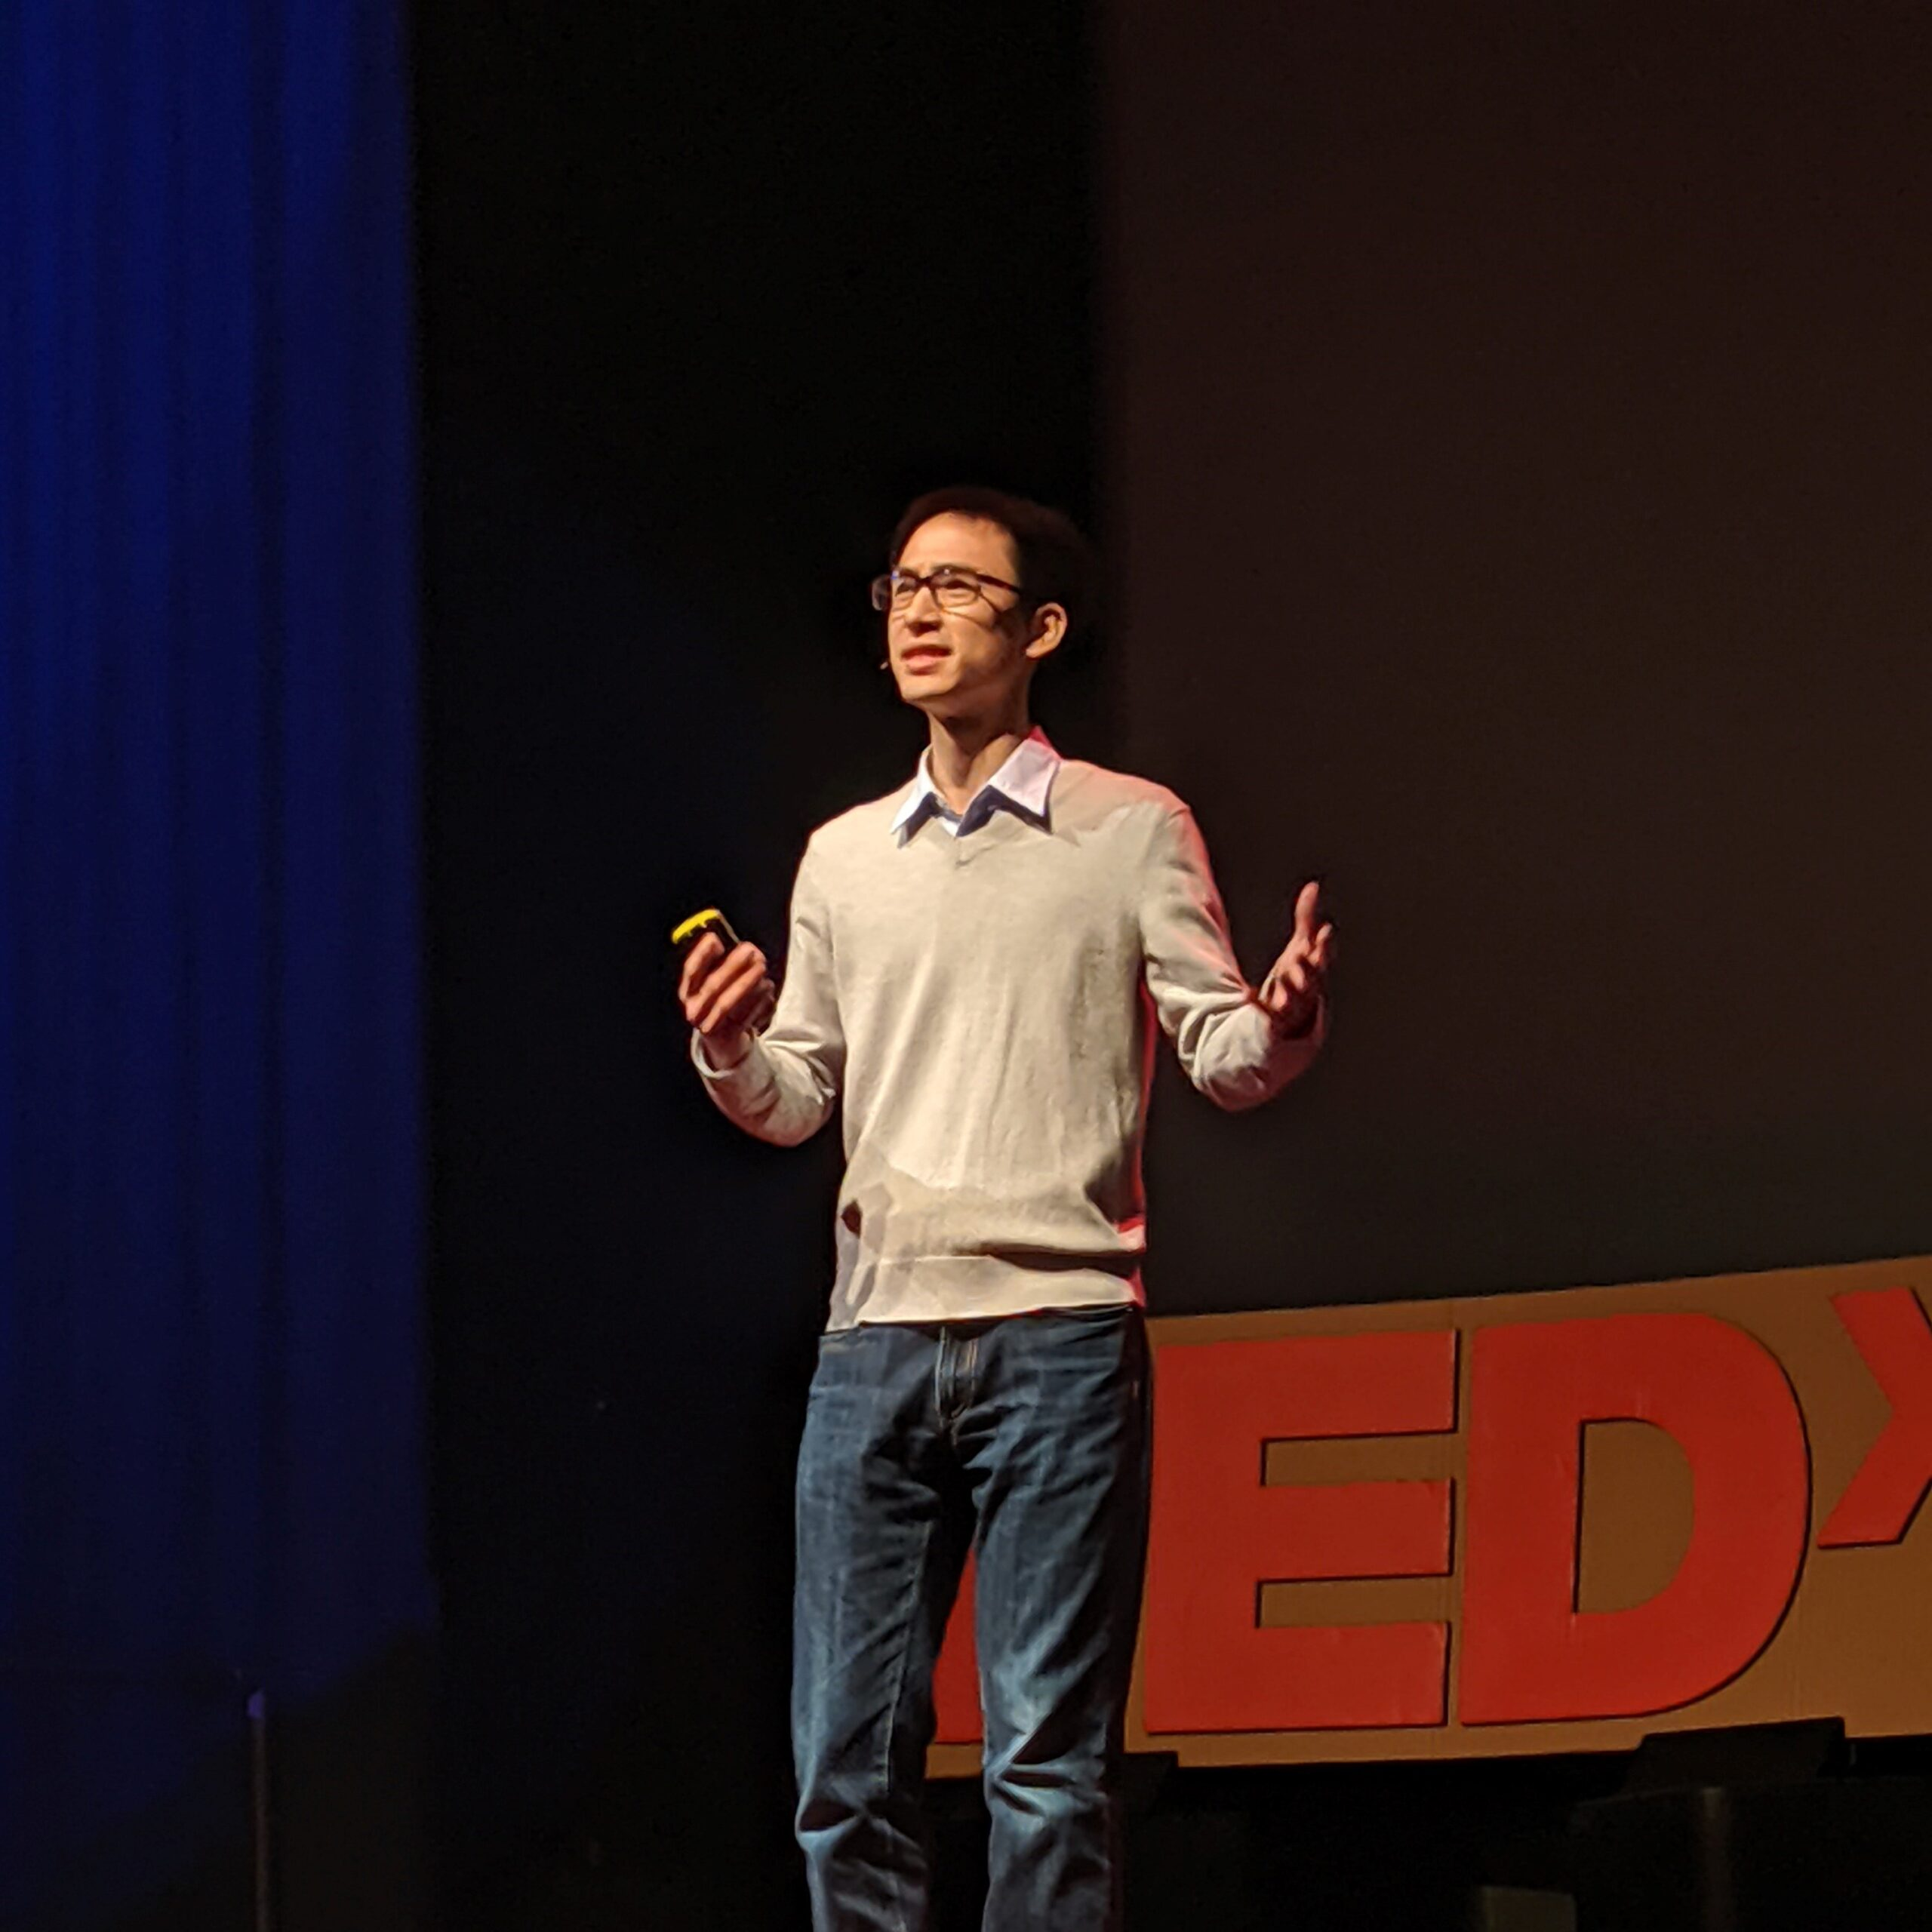 UCSC professor David Lee TEDx Santa Cruz photo by Mary Andersen